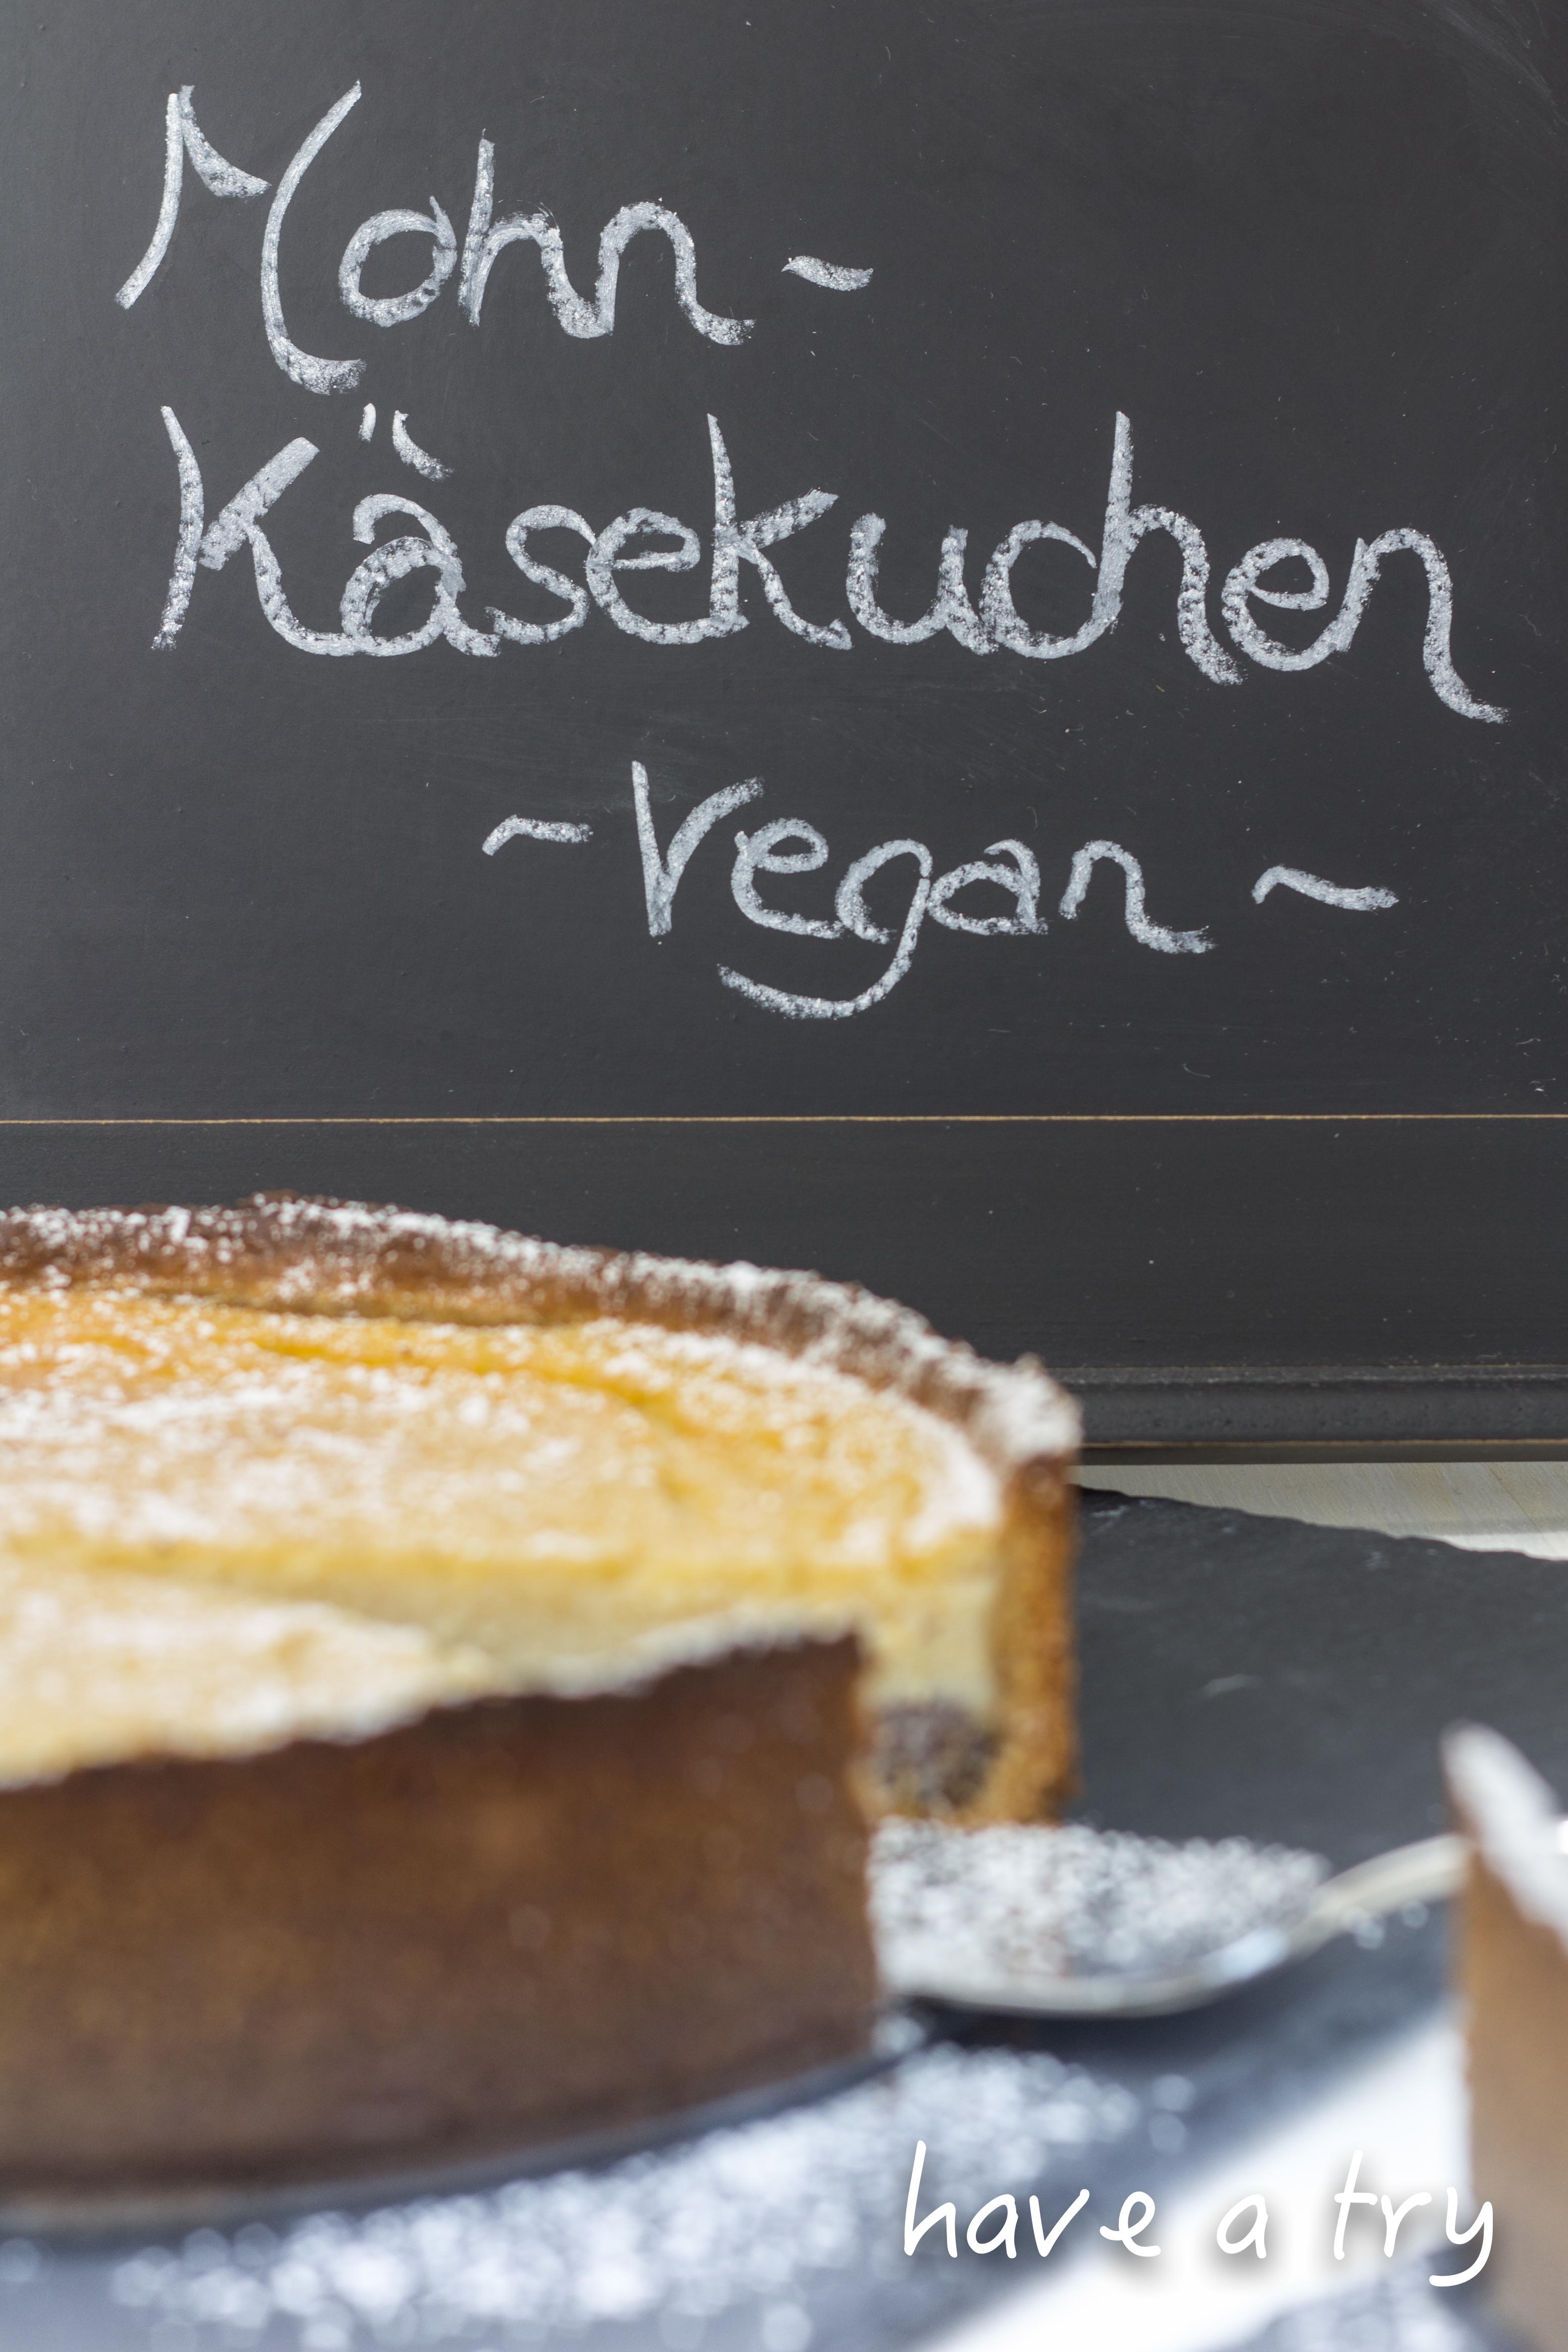 Kuchen Vegan Have A Try